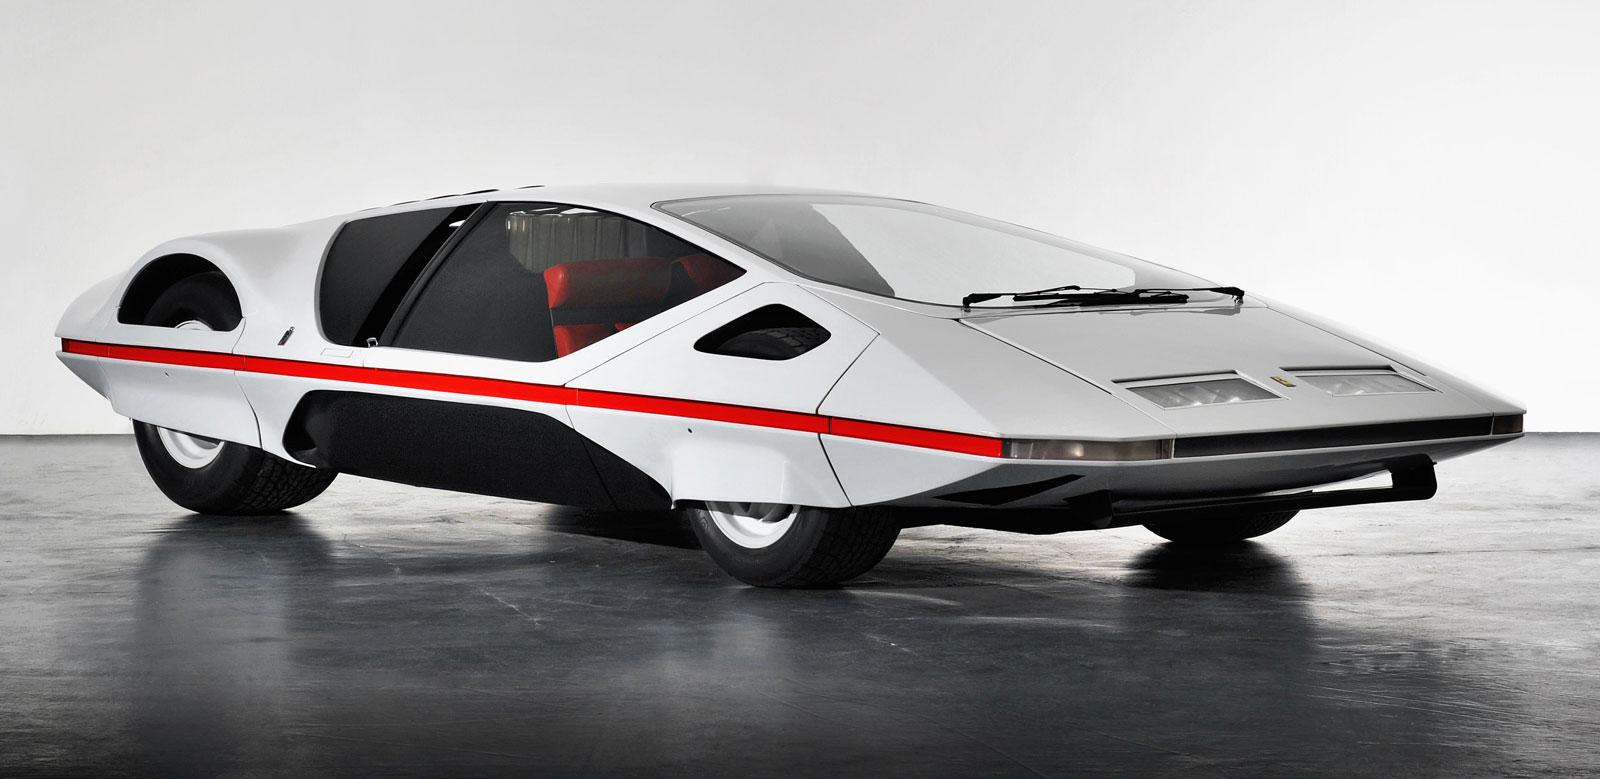 1970 Pininfarina Ferrari Modulo Concept Car Body Design